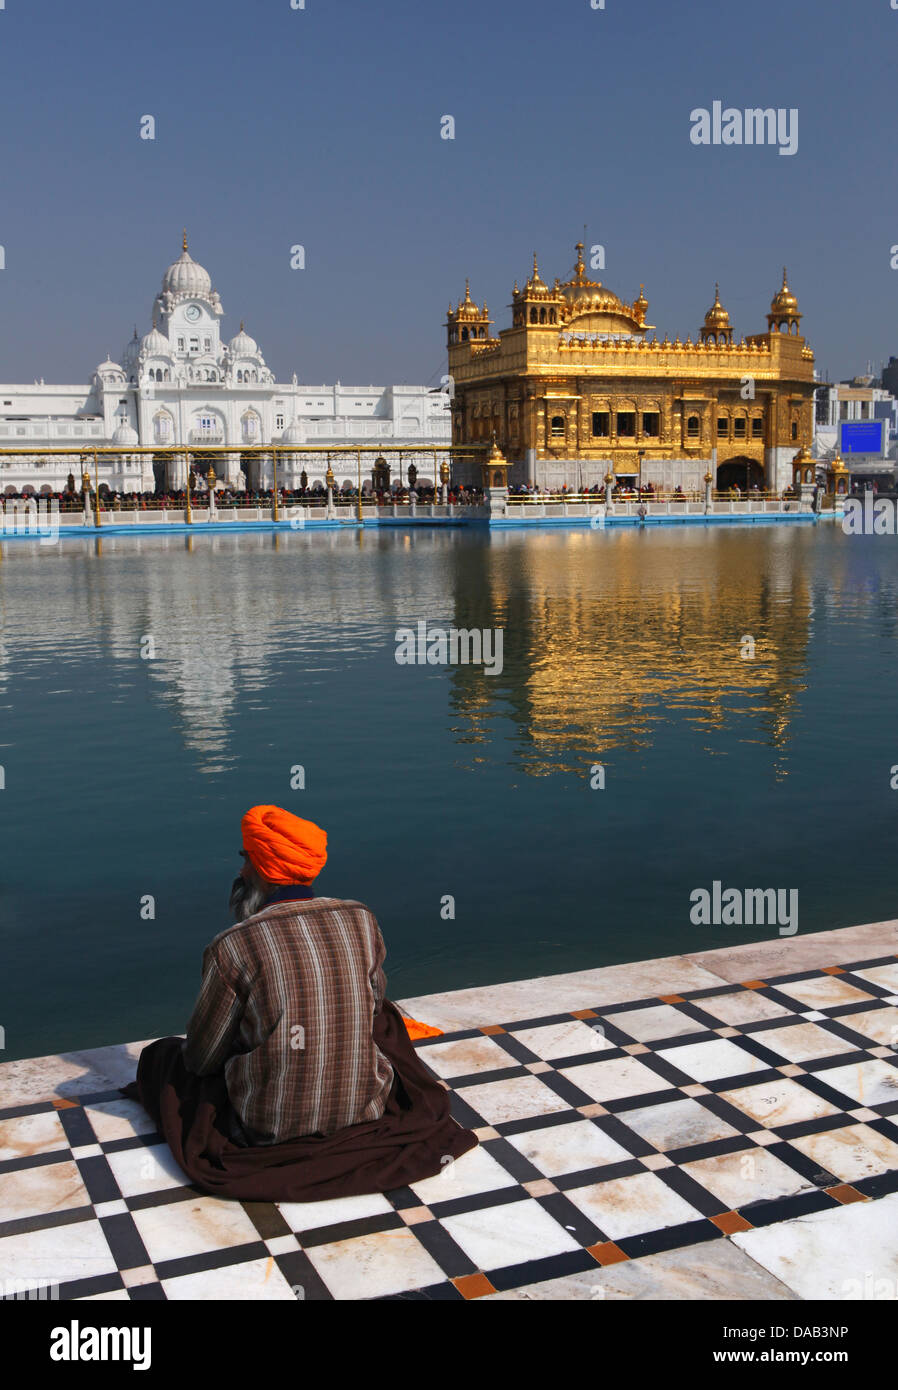 More golden, temples, Amritsar, sanctum, pray, religion, faith, sari, turban, lake, washbasin, holy, meditation, - Stock Image